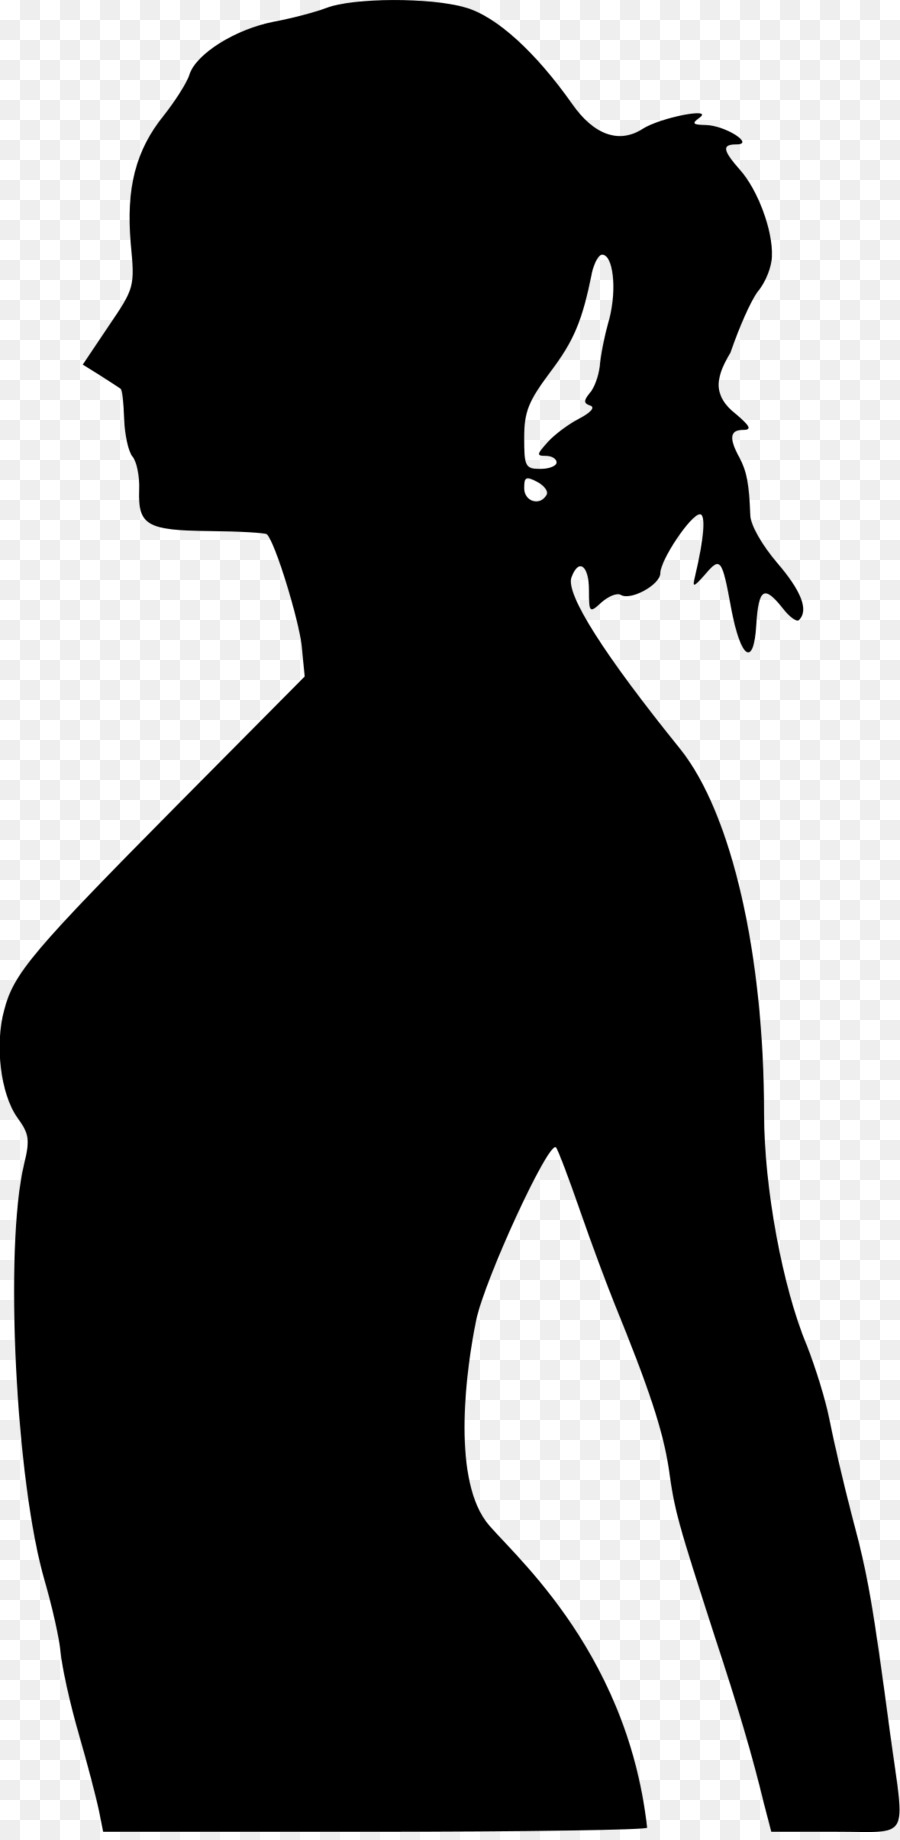 Pregnancy clipart clip art. Download free png woman